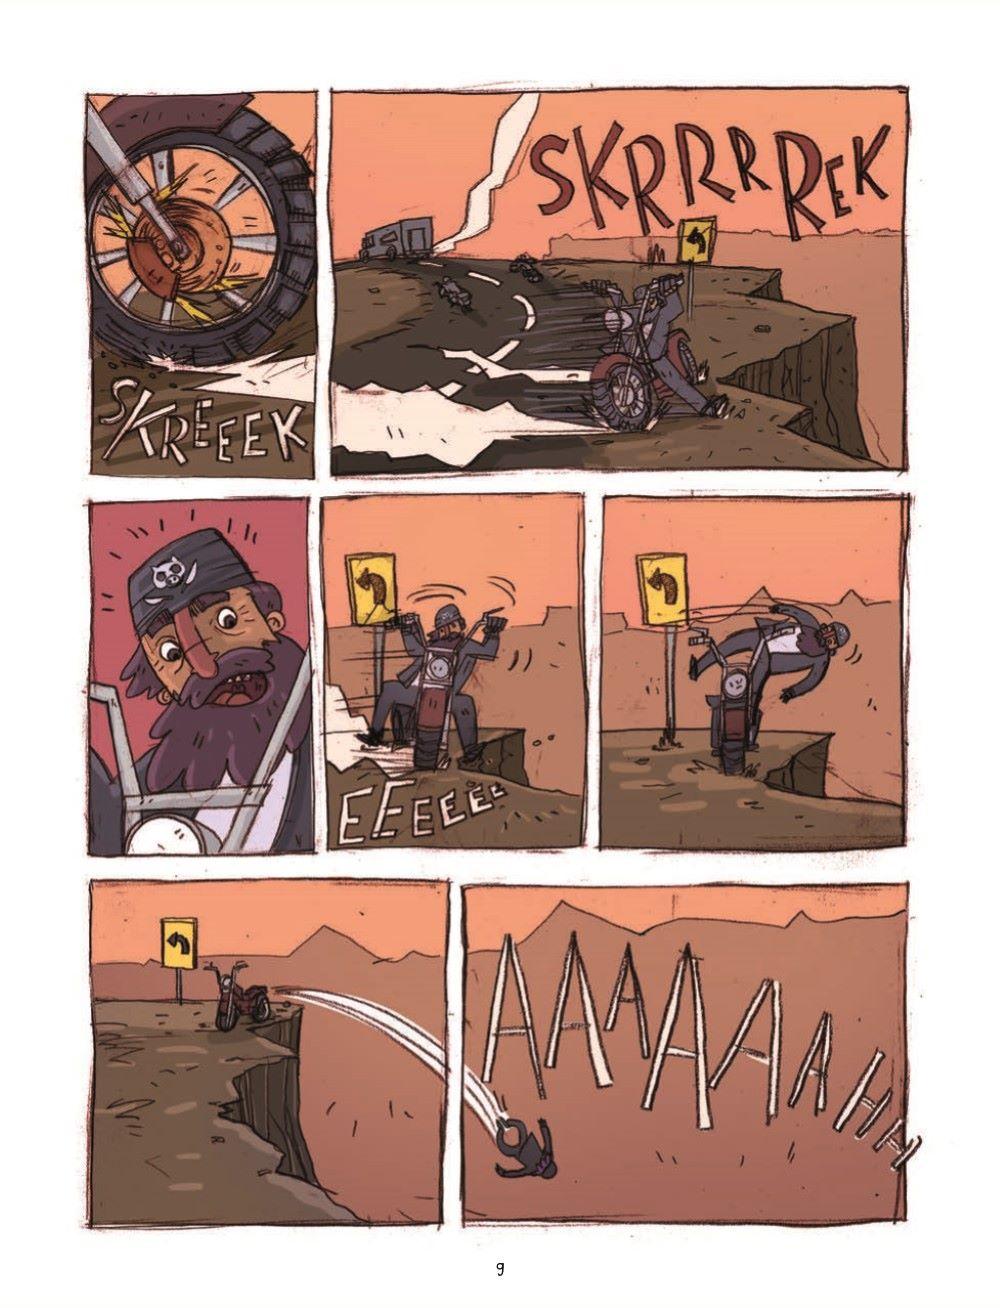 ONION_SKIN_pr-7 ComicList Previews: ONION SKIN GN